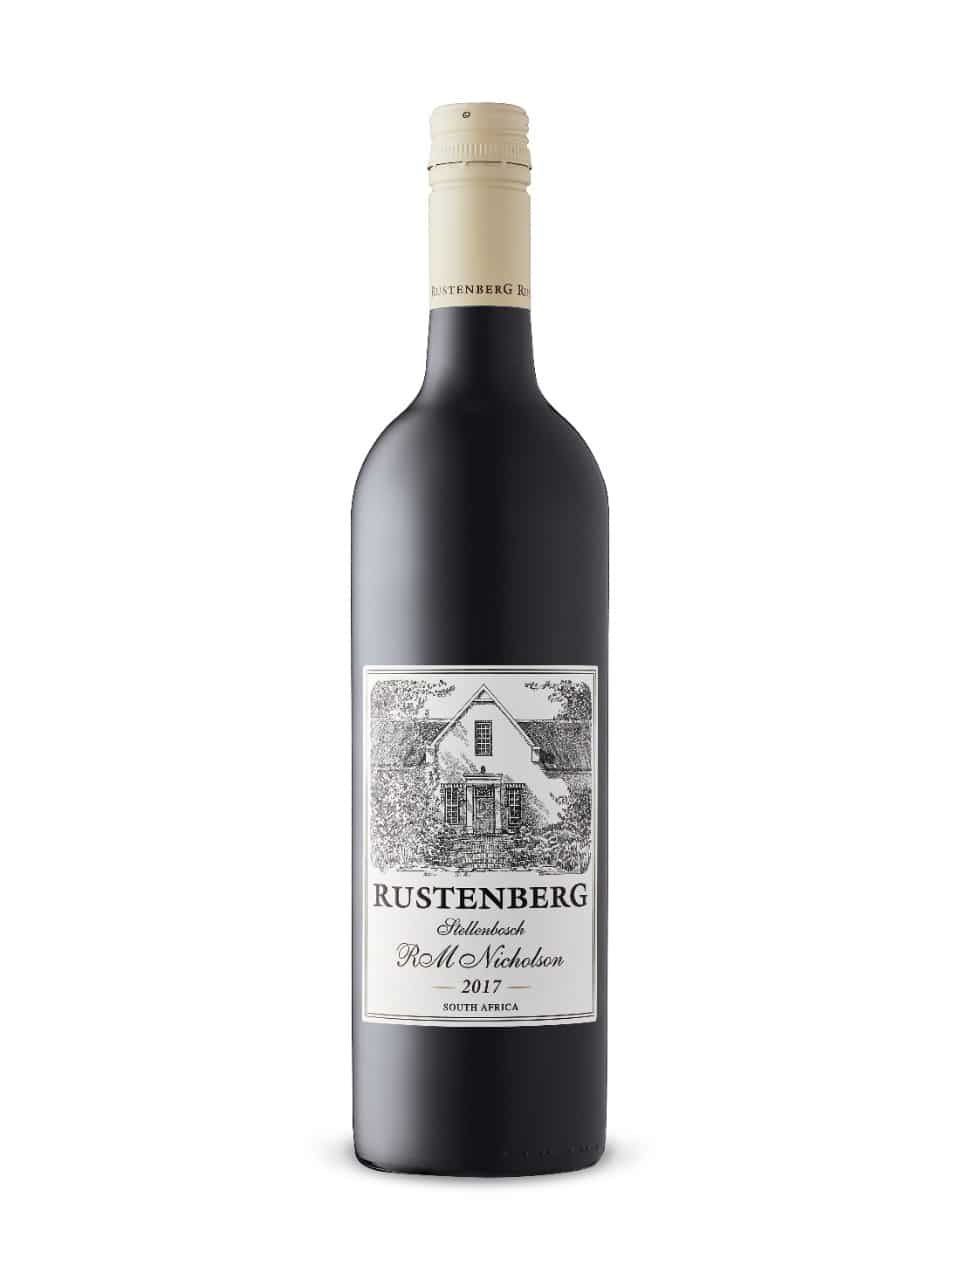 $16.95 - Rustenberg RM Nicholson 2017